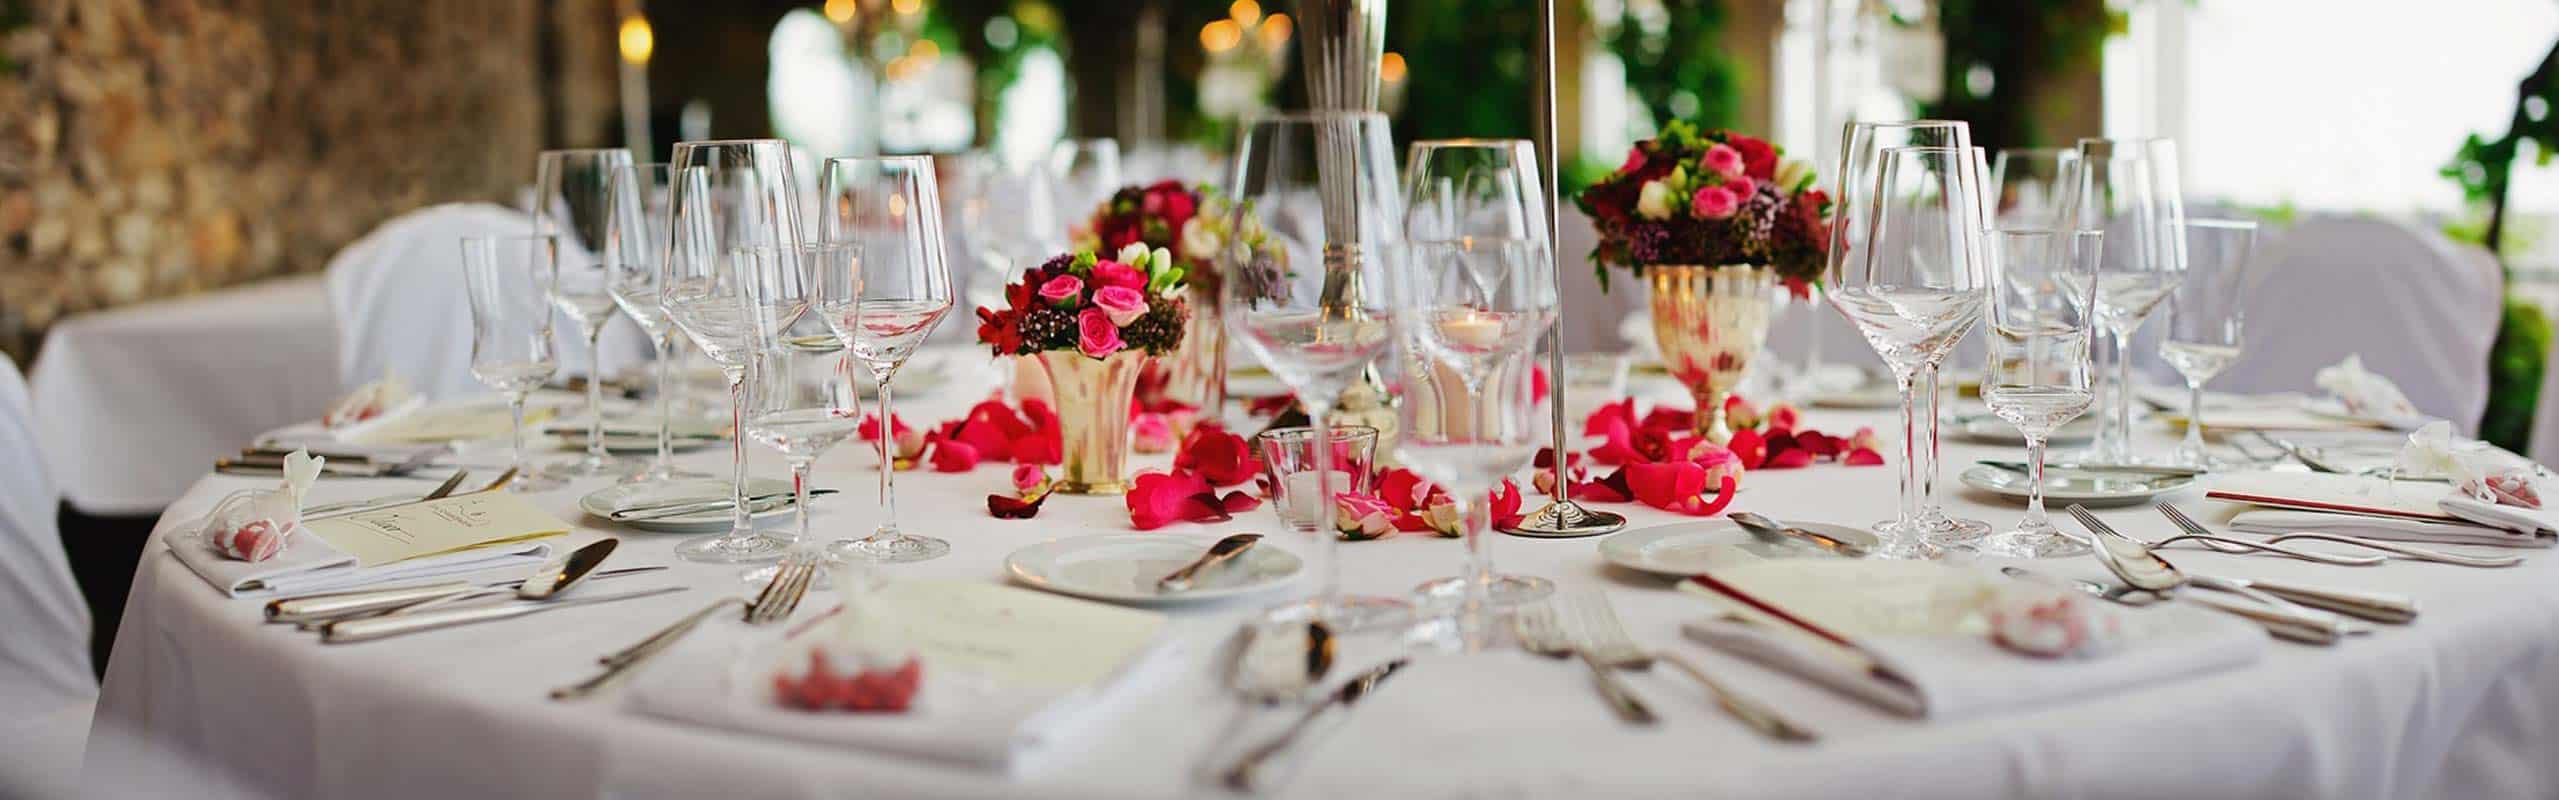 Descubre como se organiza unas bodas de plata